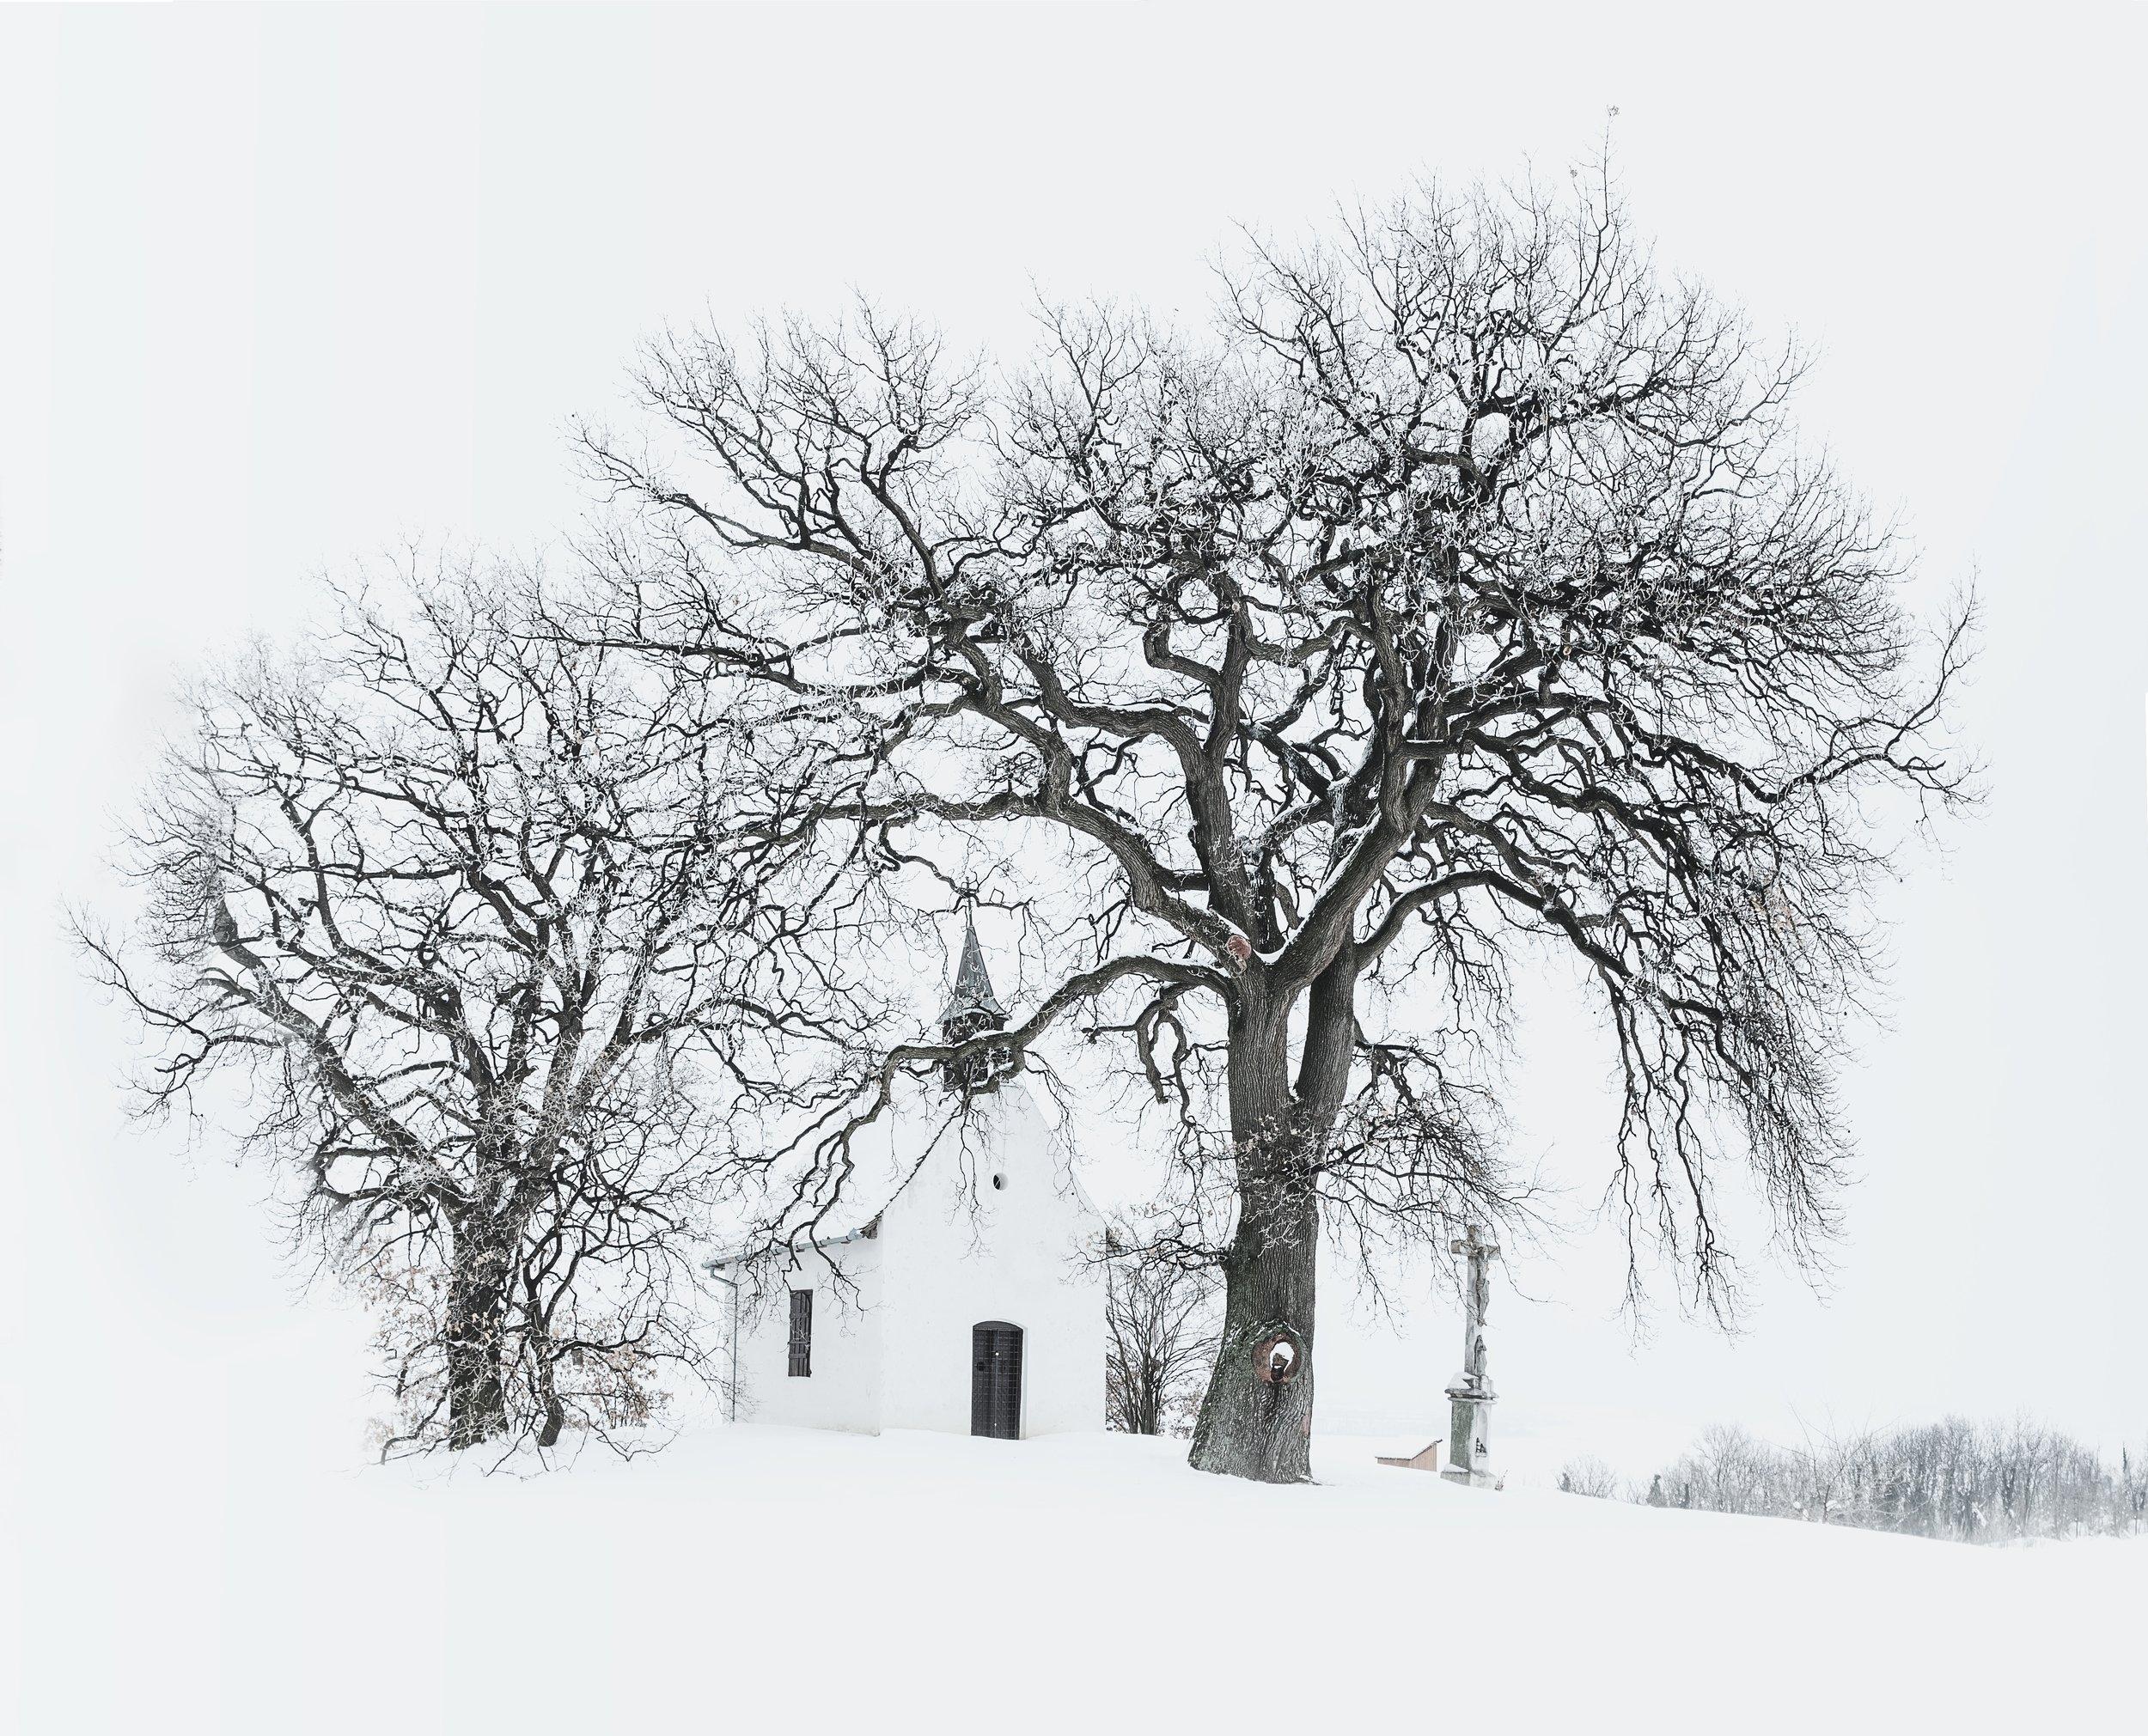 Bleak Winter Scene with Church in Background